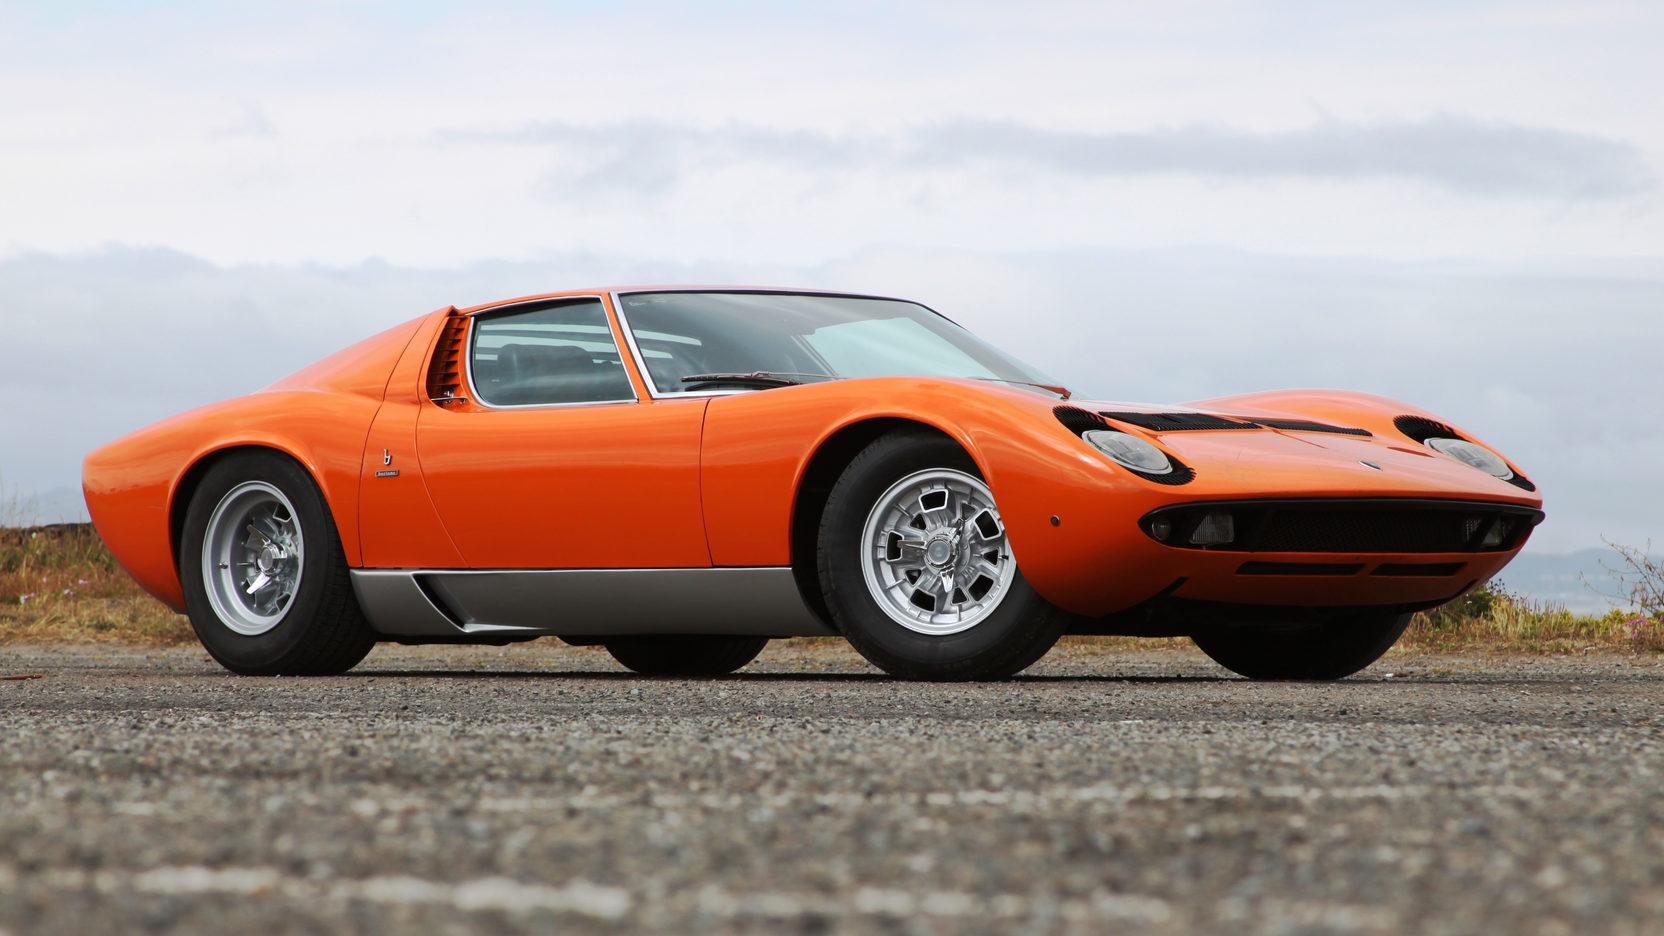 HD Quality Wallpaper | Collection: Vehicles, 1664x936 Lamborghini Miura